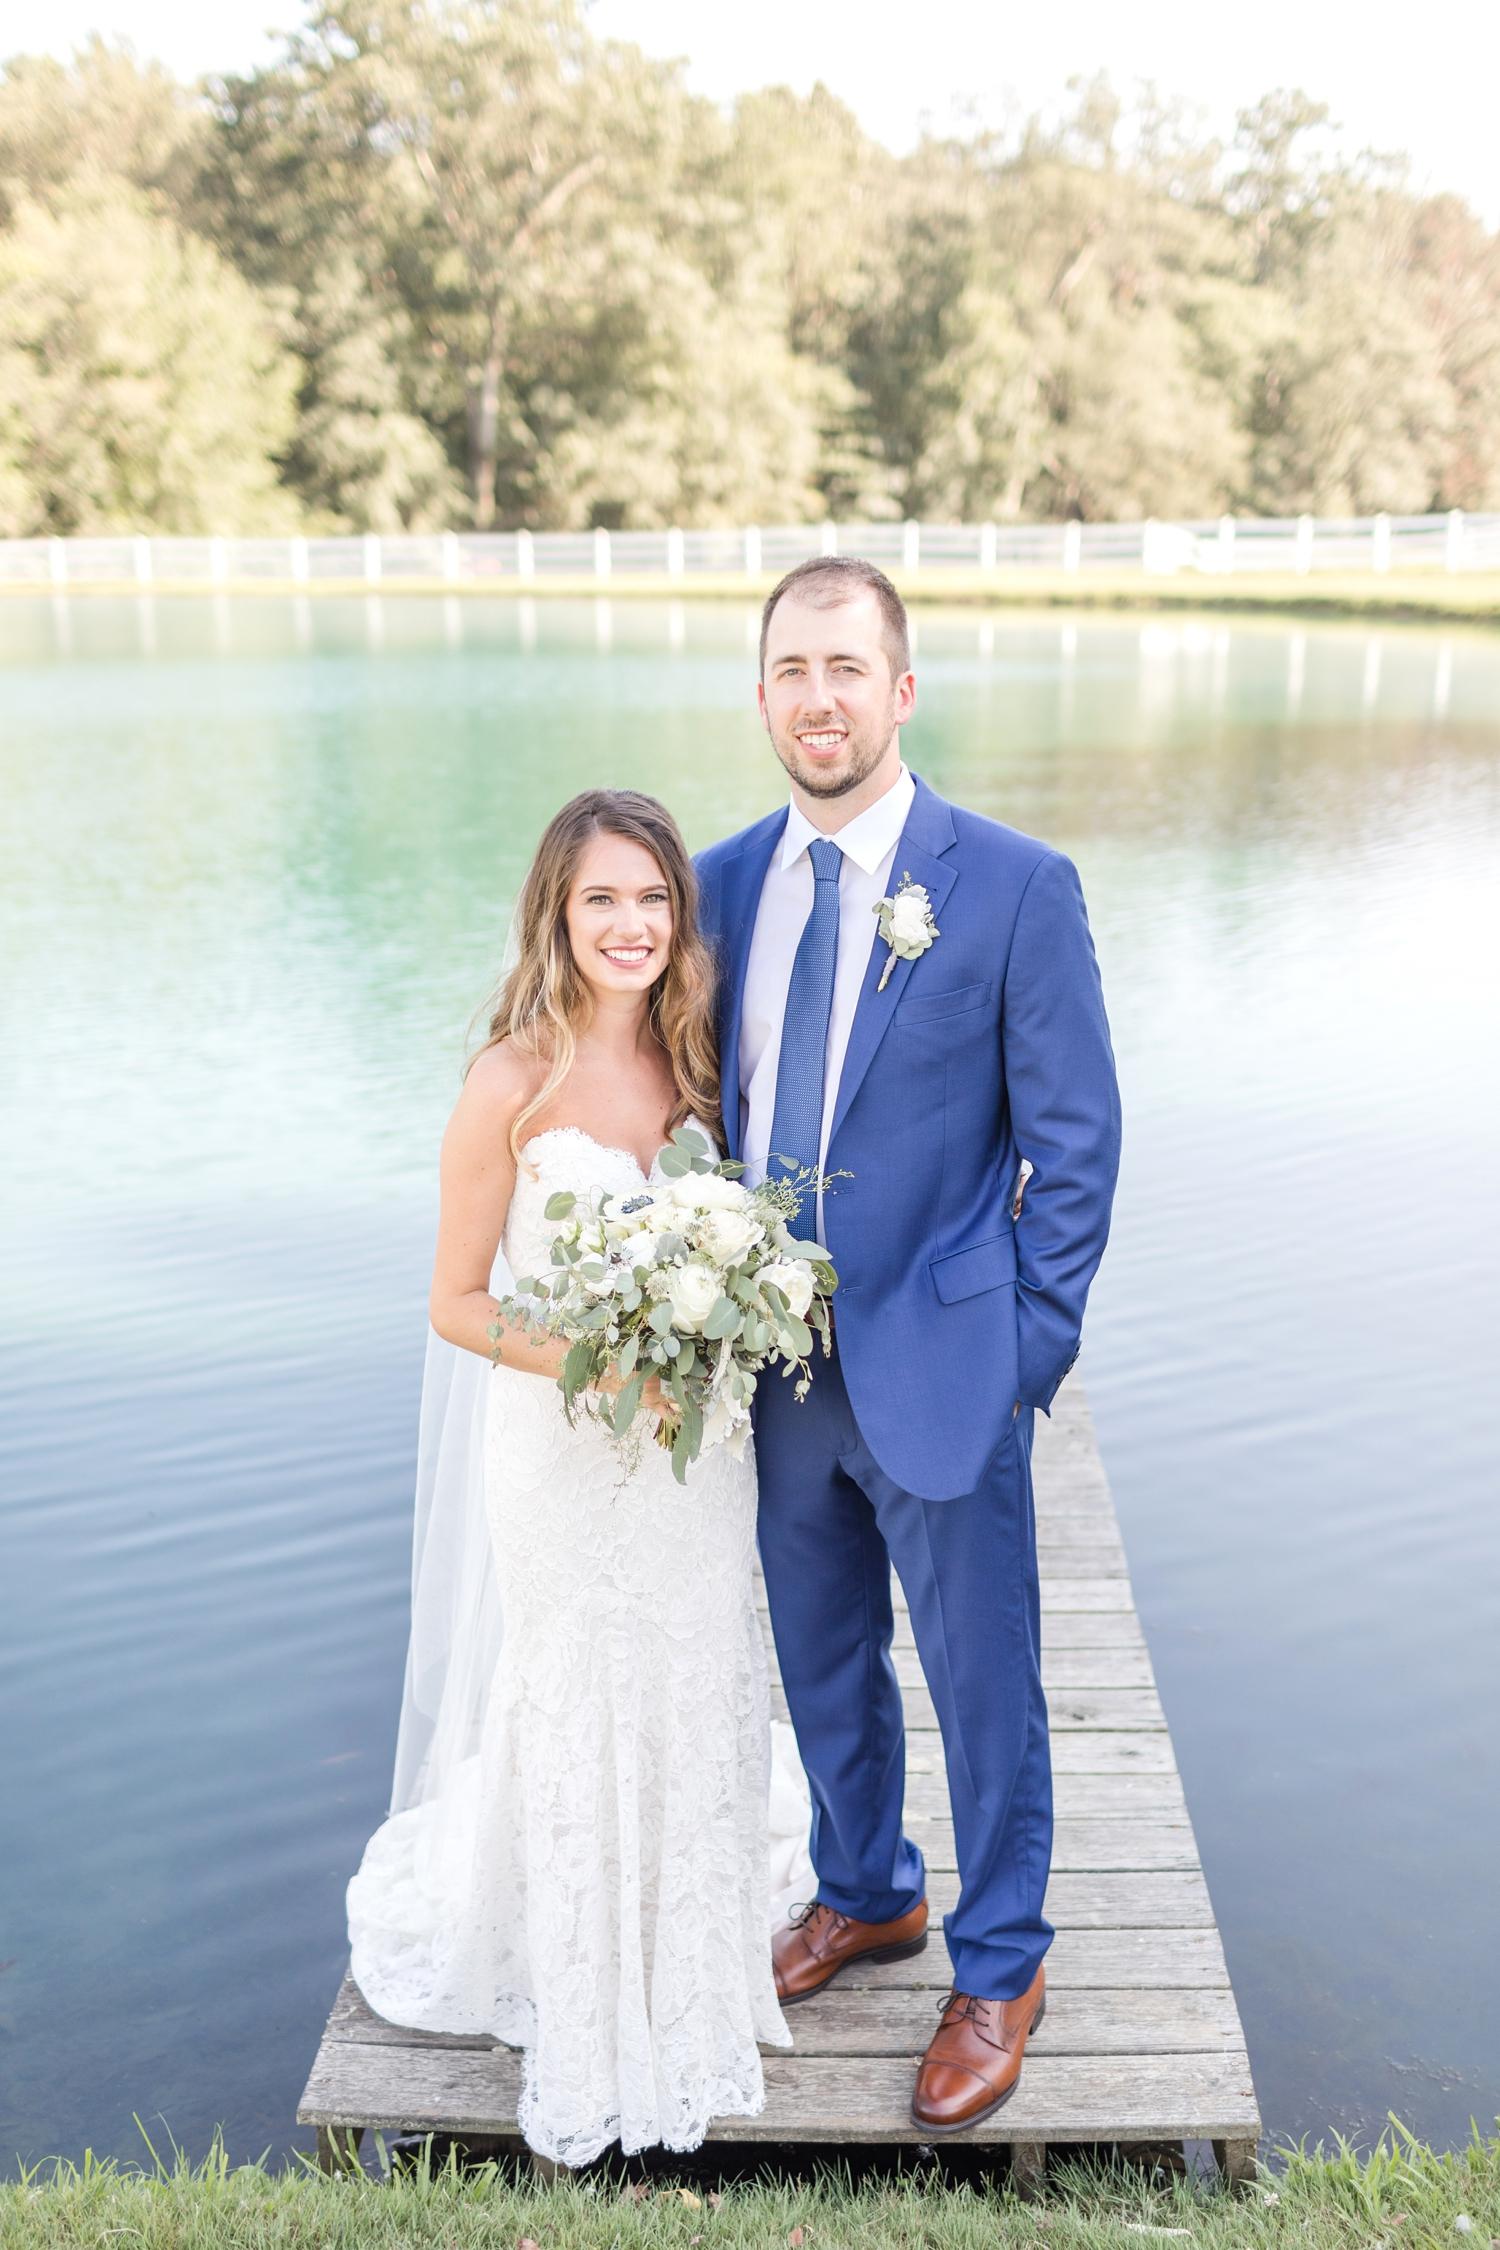 Webb WEDDING HIGHLIGHTS-281_Pond-View-Farm-wedding-Maryland-wedding-photographer-anna-grace-photography-photo.jpg